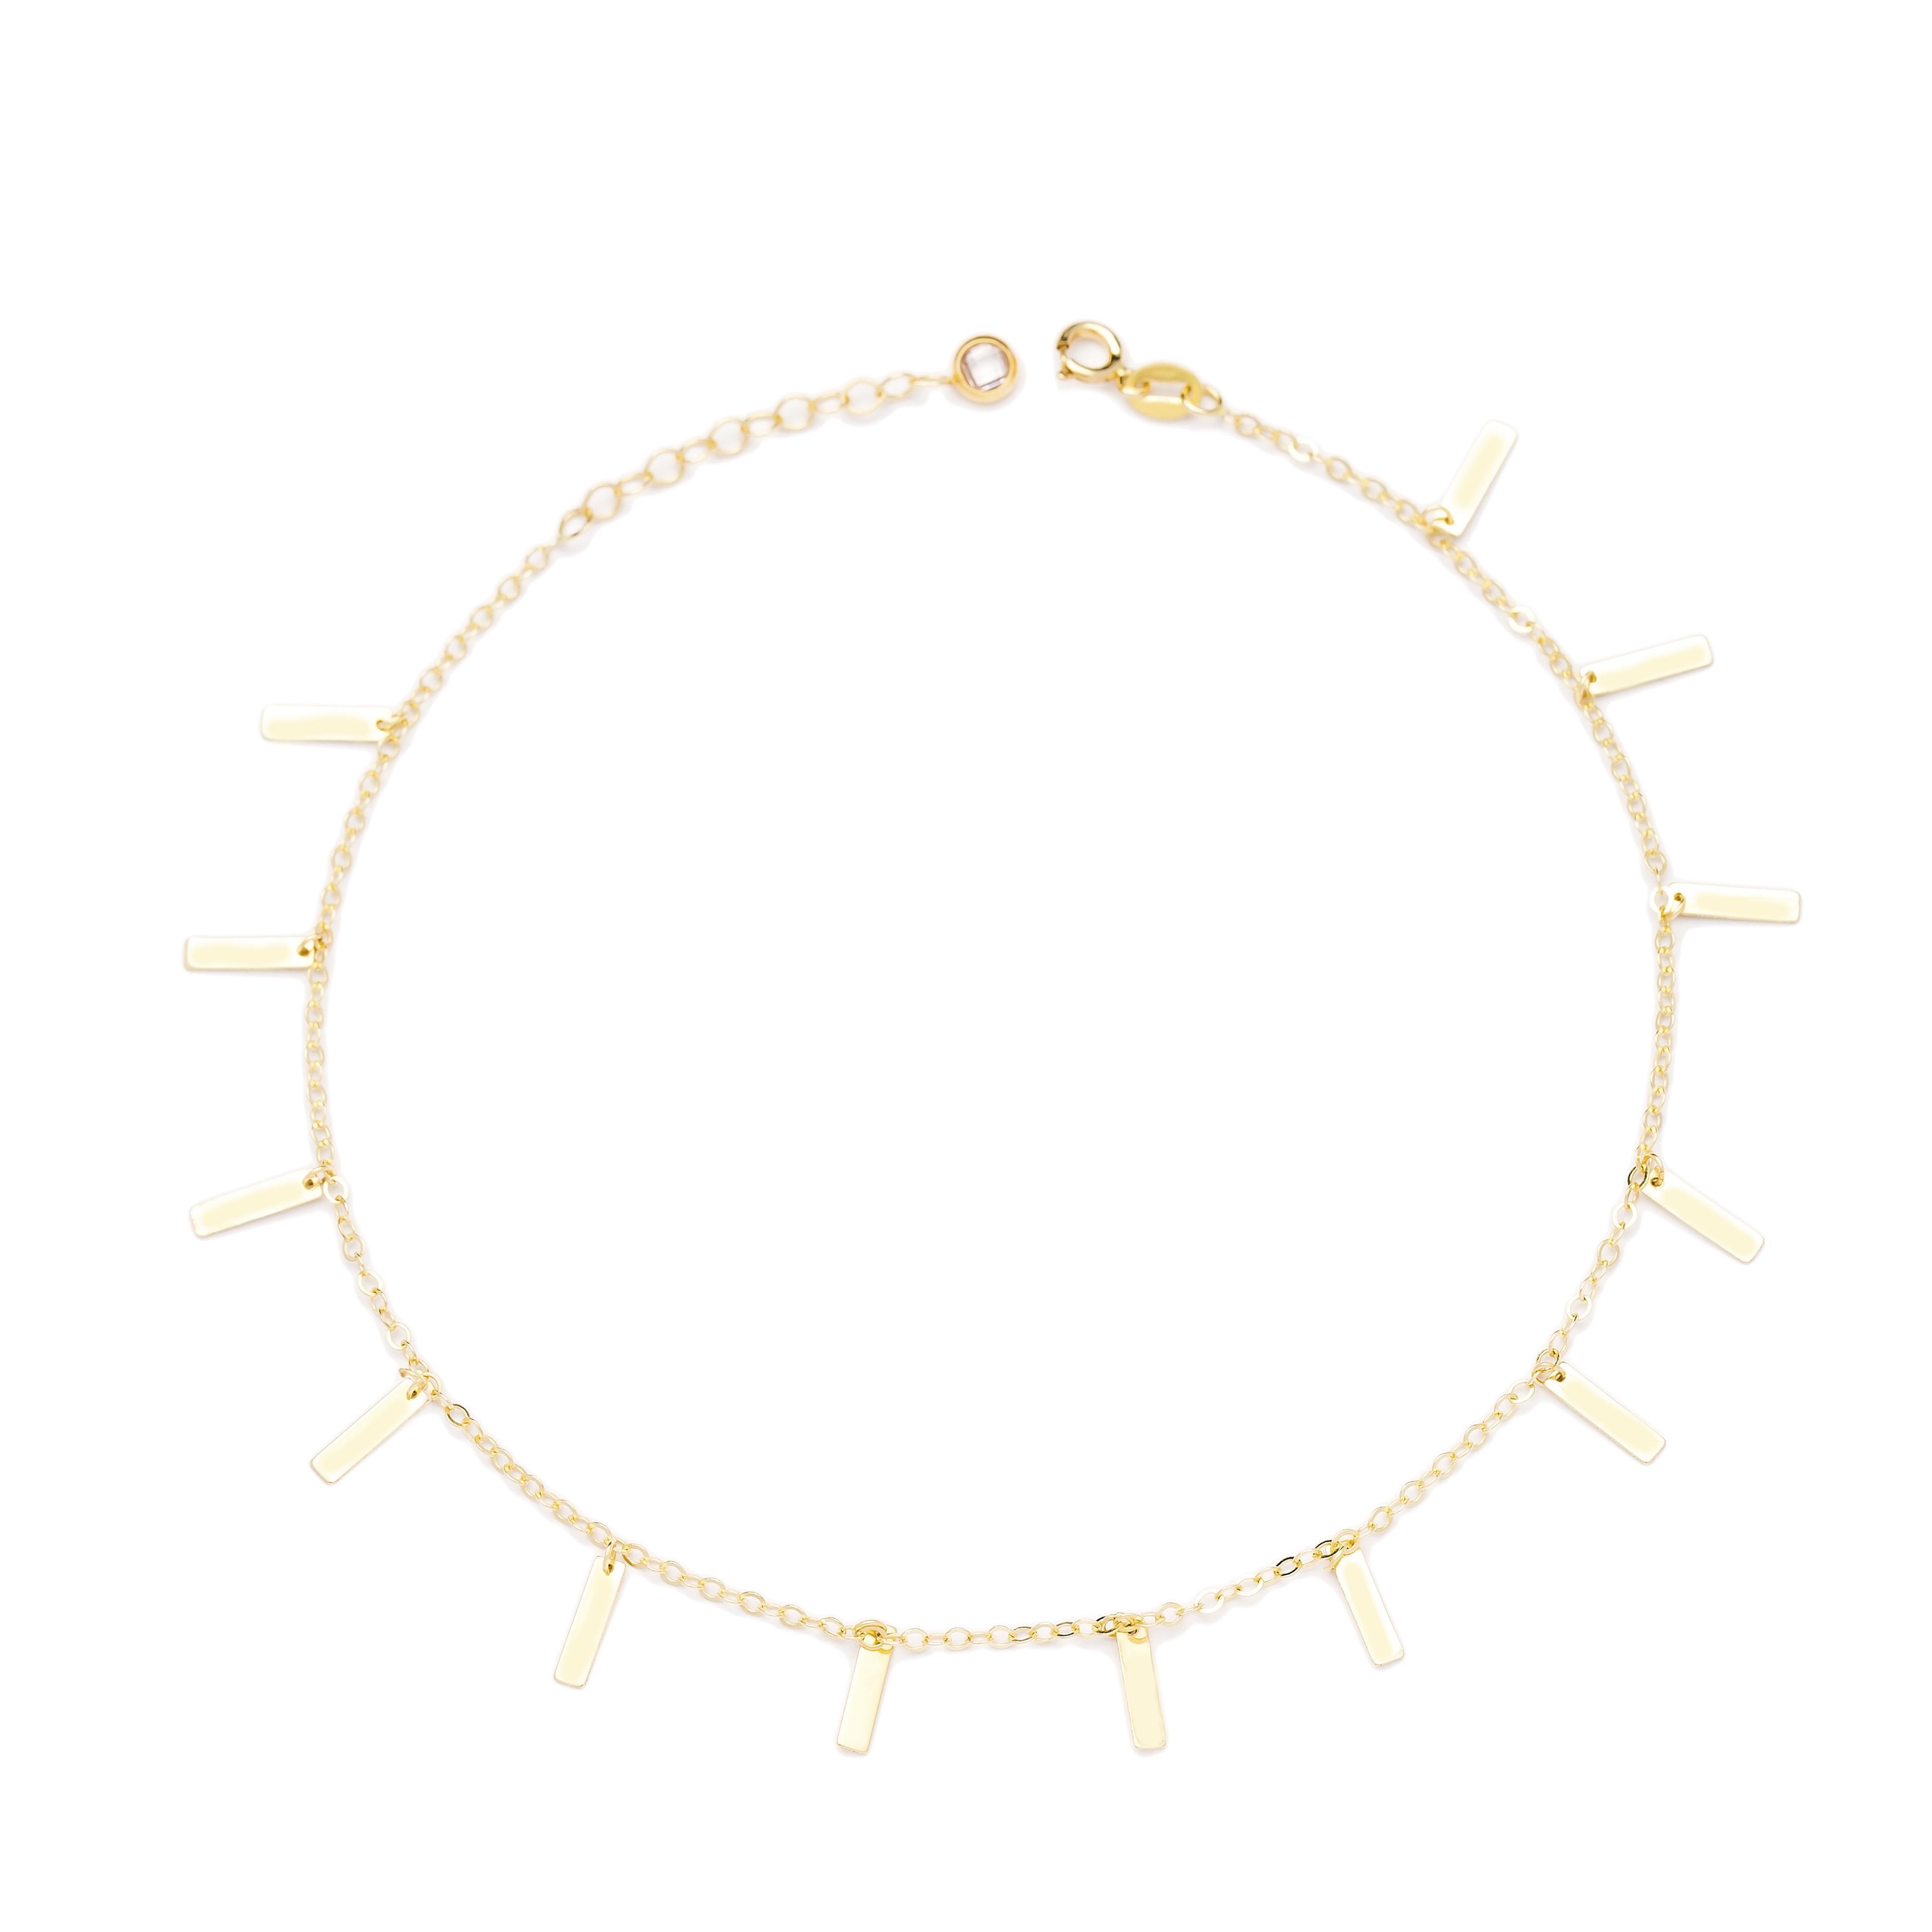 Shaker Minimalist Shape 10k Gold Anklet Turkish Wholesale Gold Jewelry